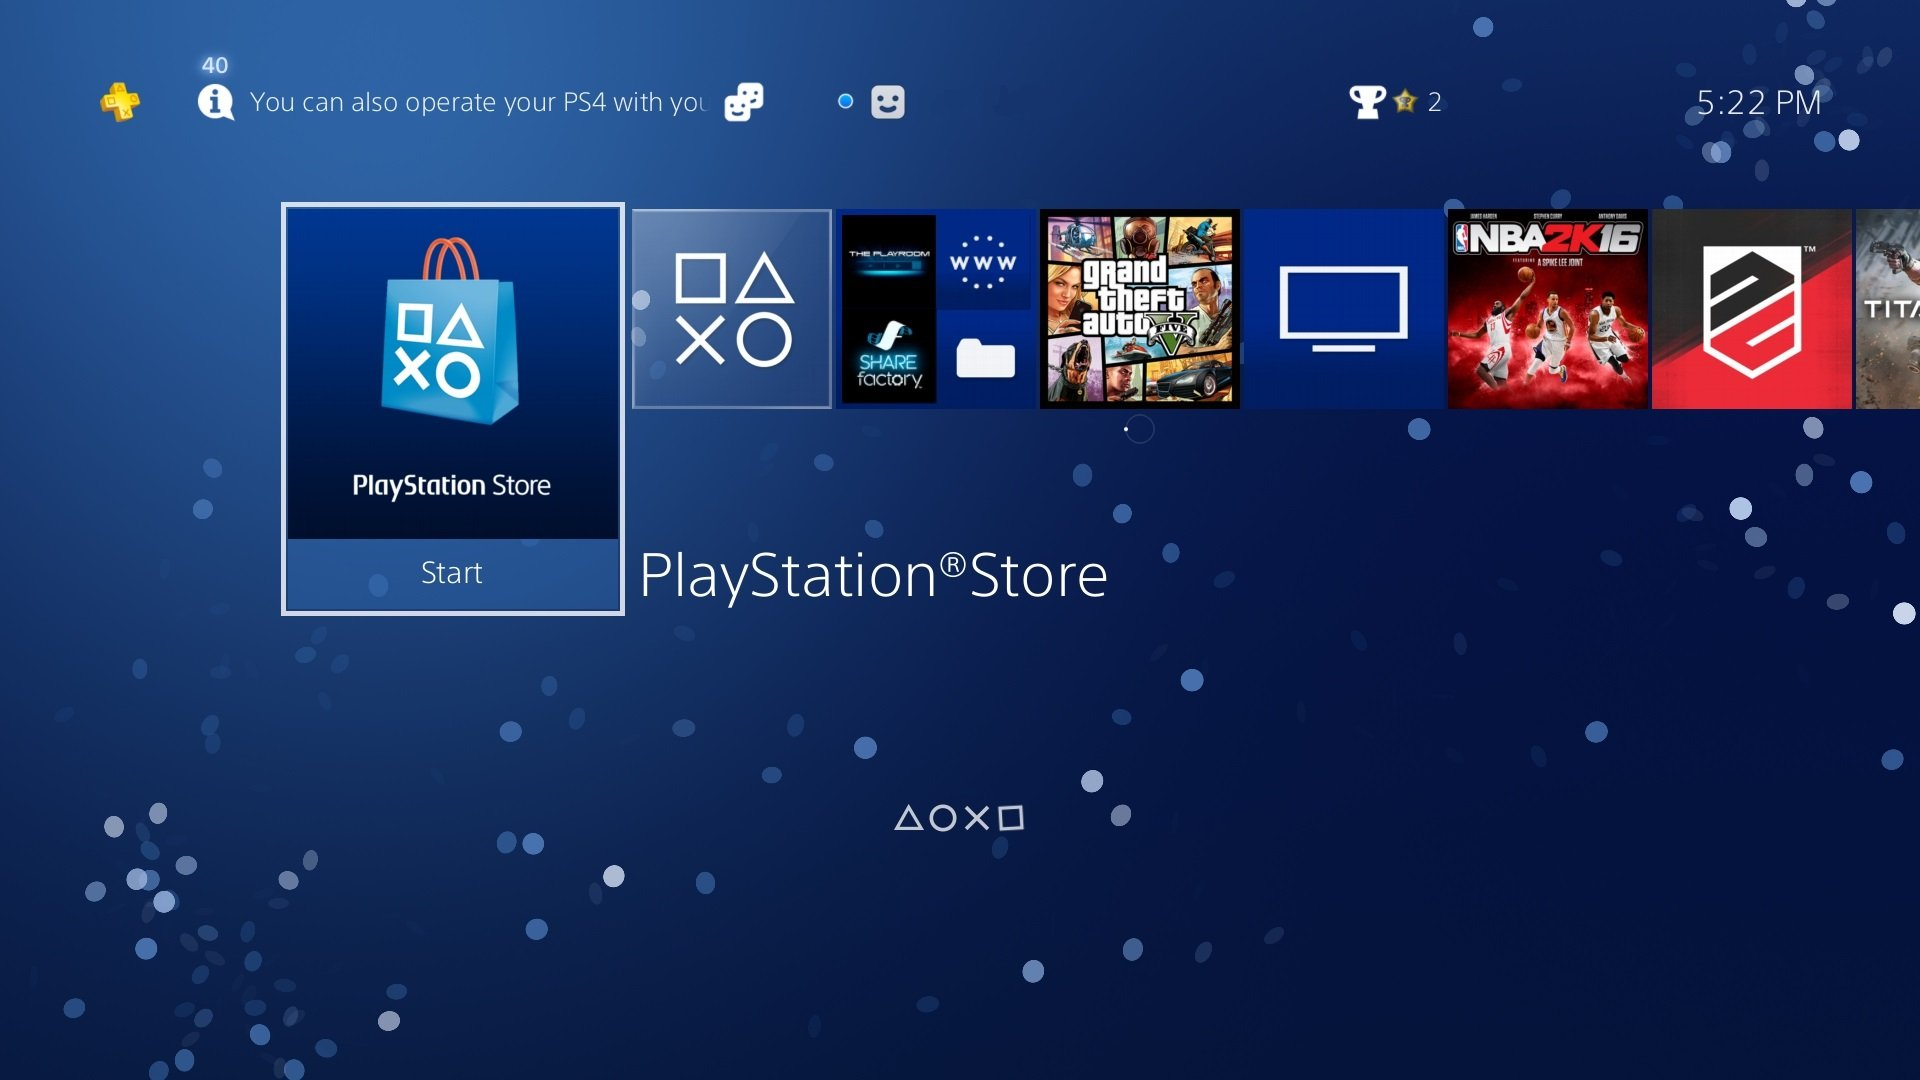 PlayStation 4 UI update